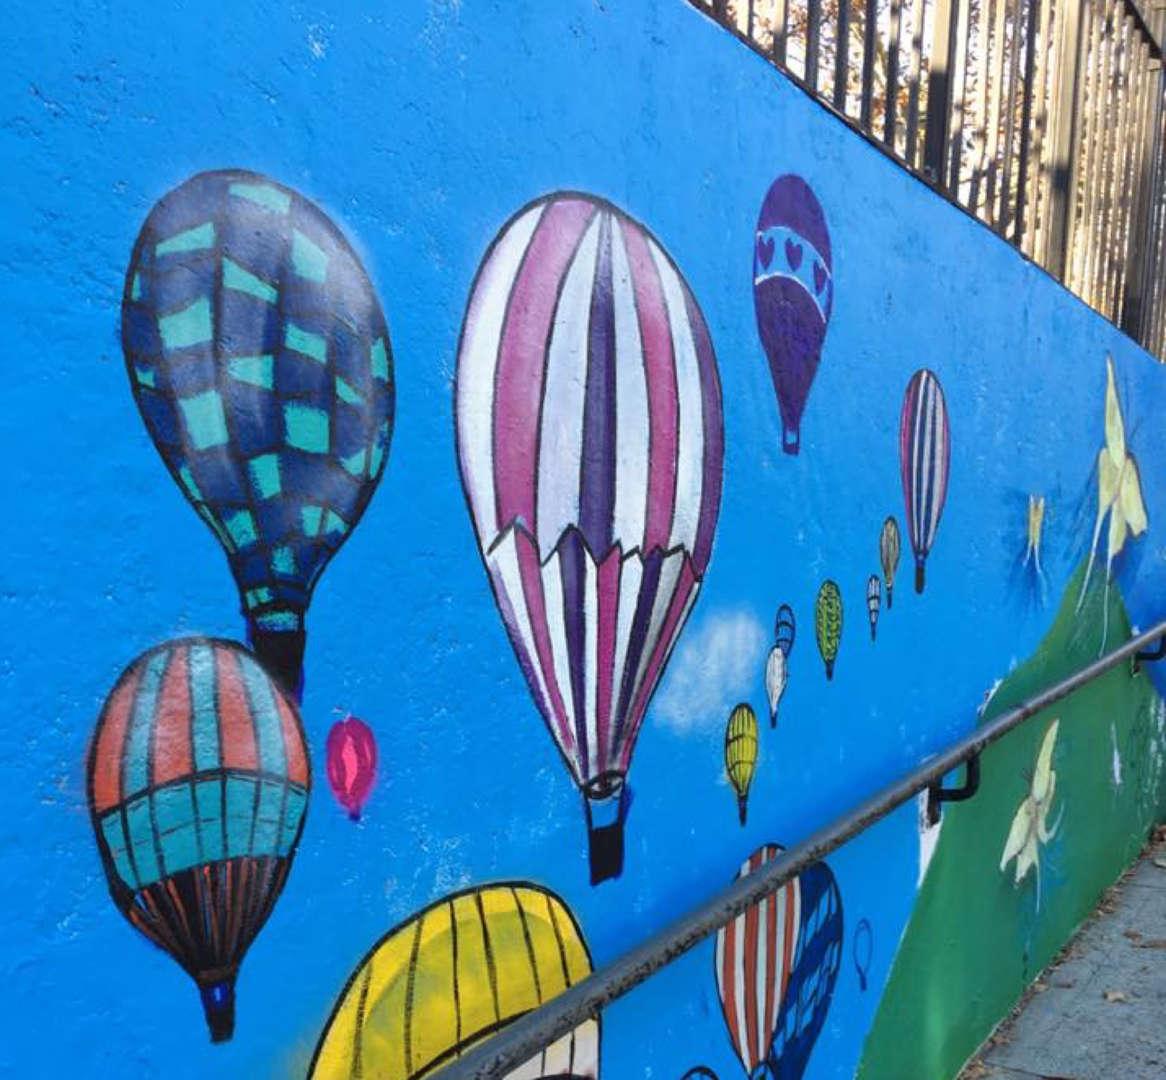 Mosholu Playground Hot Air Balloons